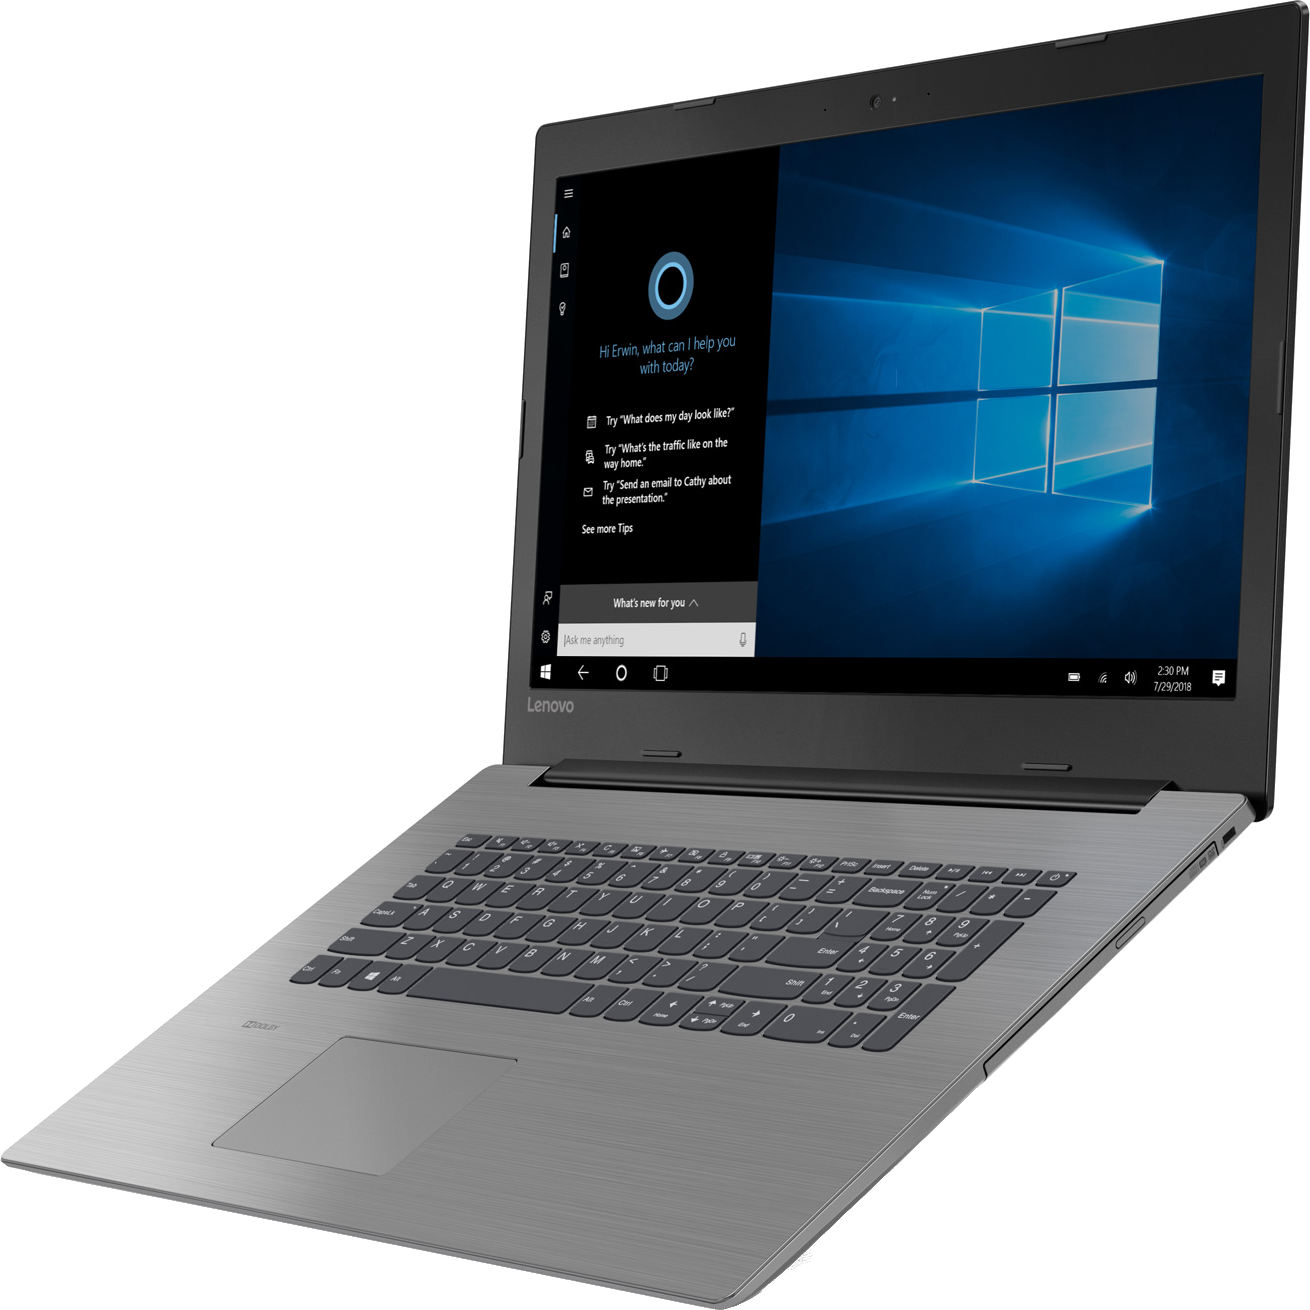 Test Labo du Lenovo IdeaPad 330-17IKB : un écran très perfectible